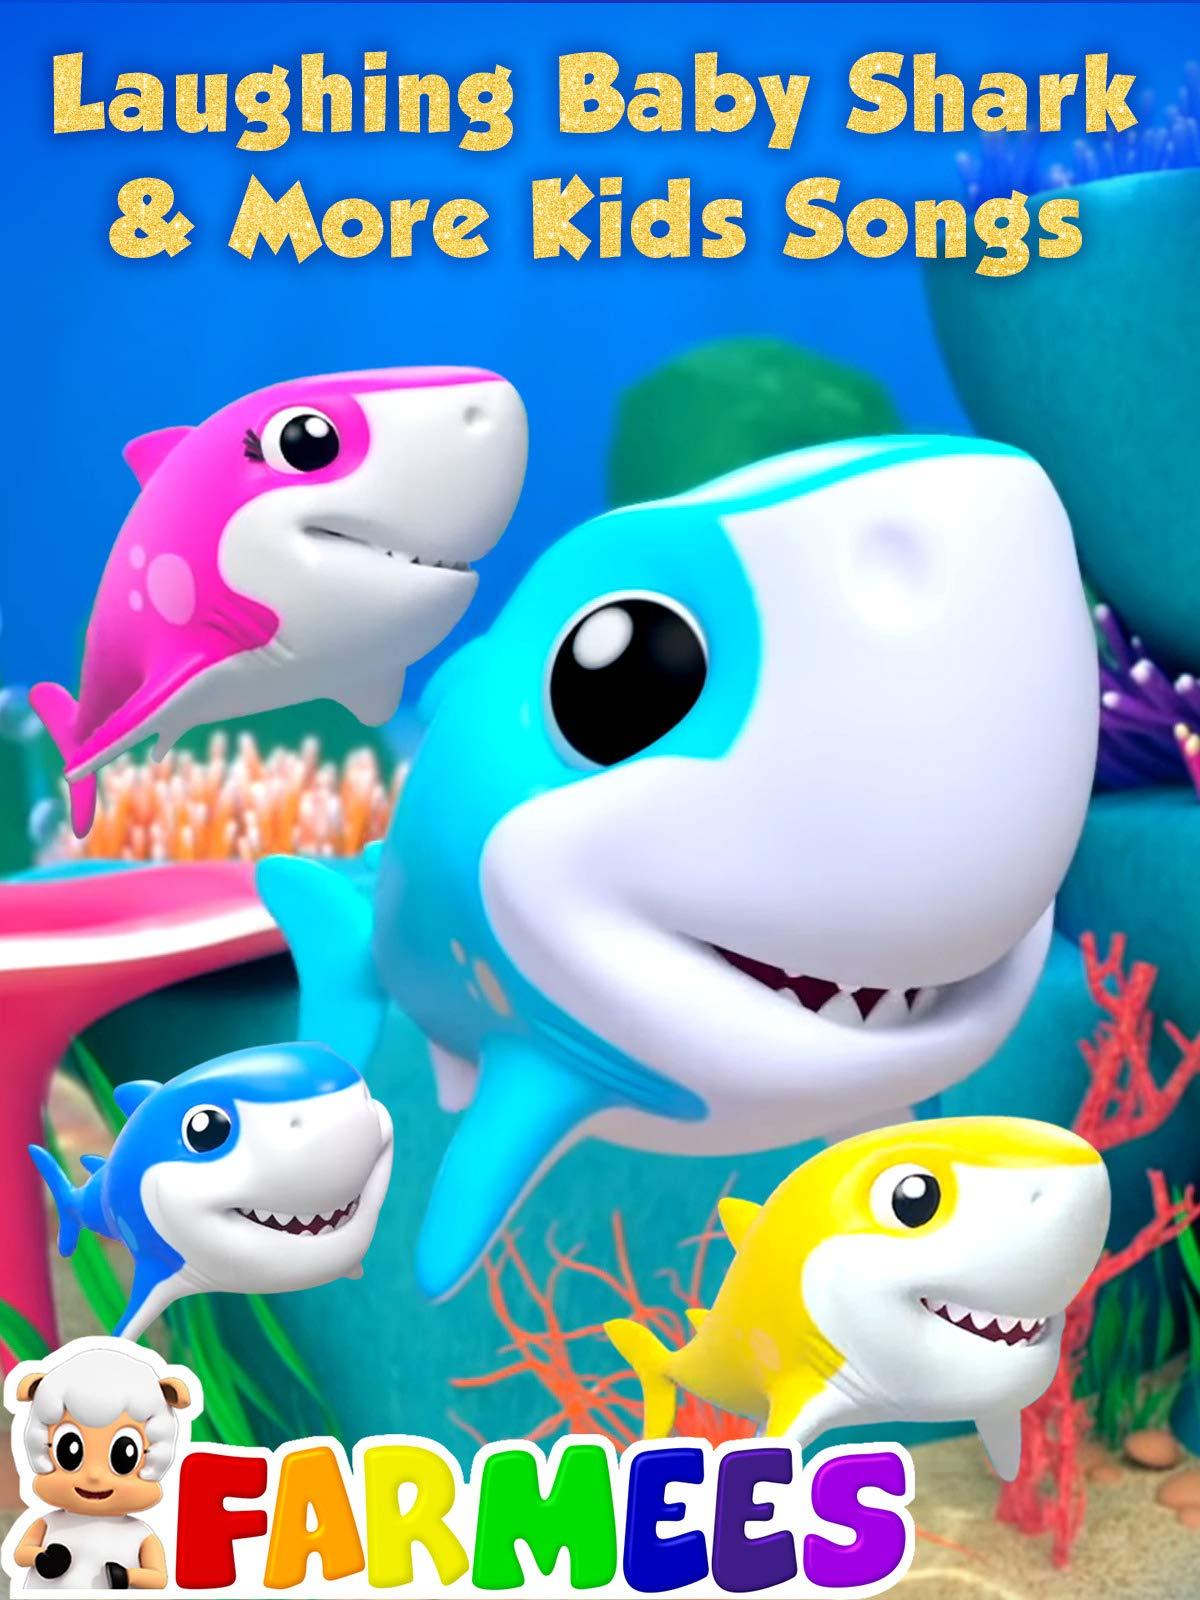 Laughing Baby Shark & More Kids Songs - Farmees